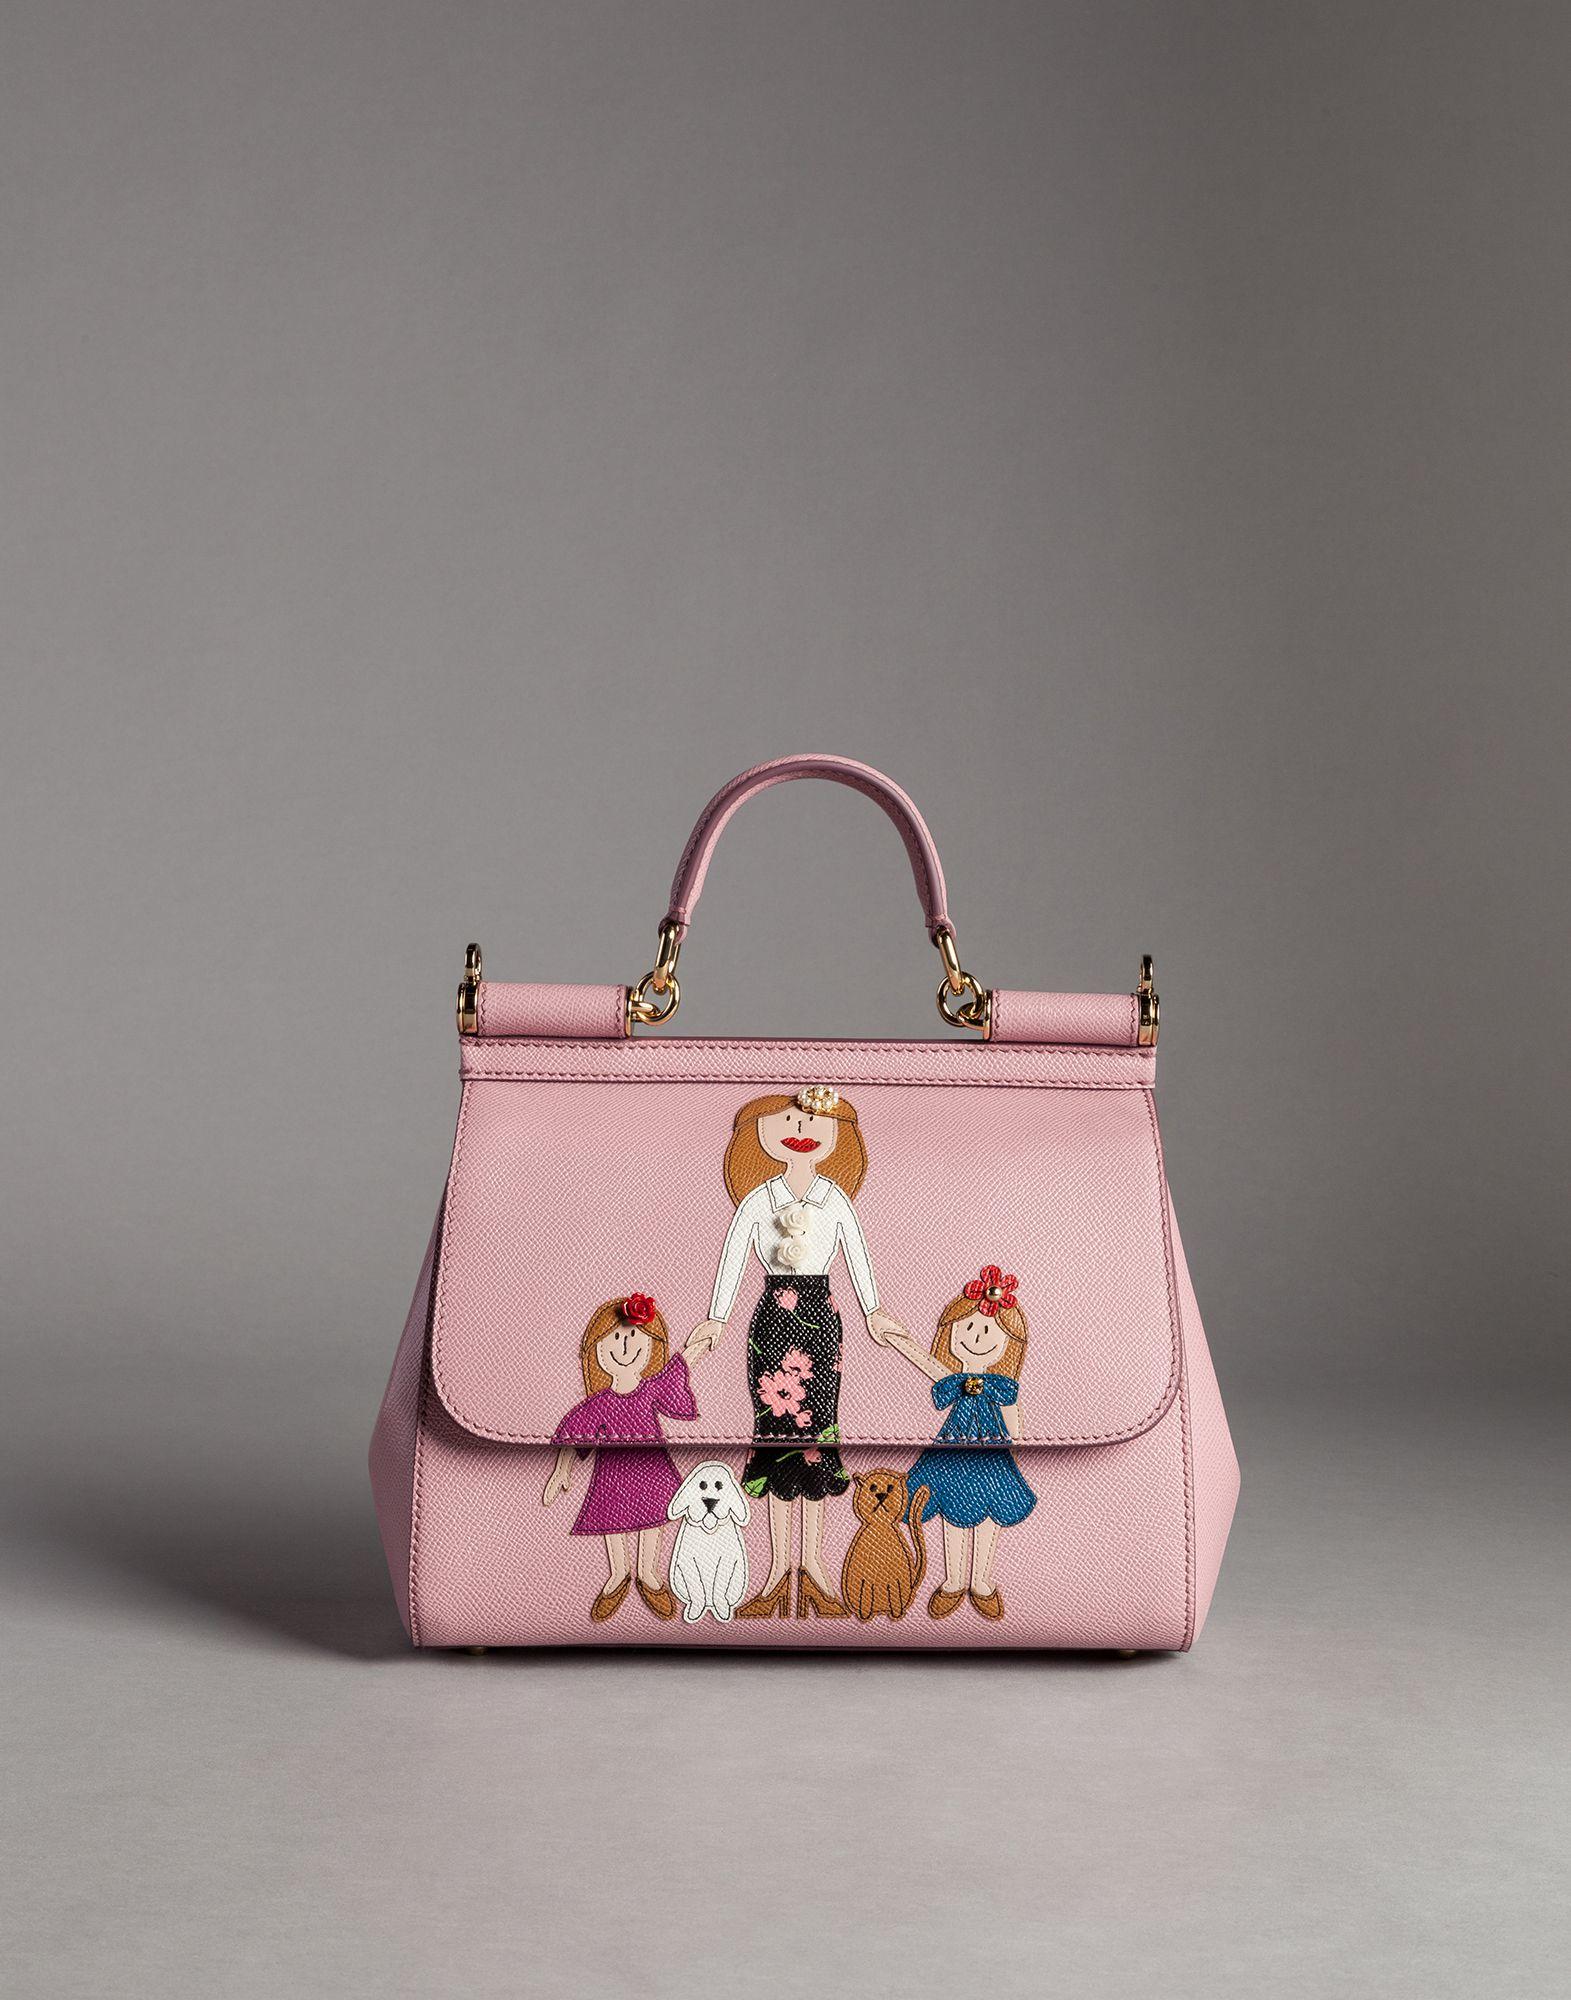 Lyst - Dolce   Gabbana Medium Dauphine Calfskin Sicily Bag With ... 296fa58defbe2